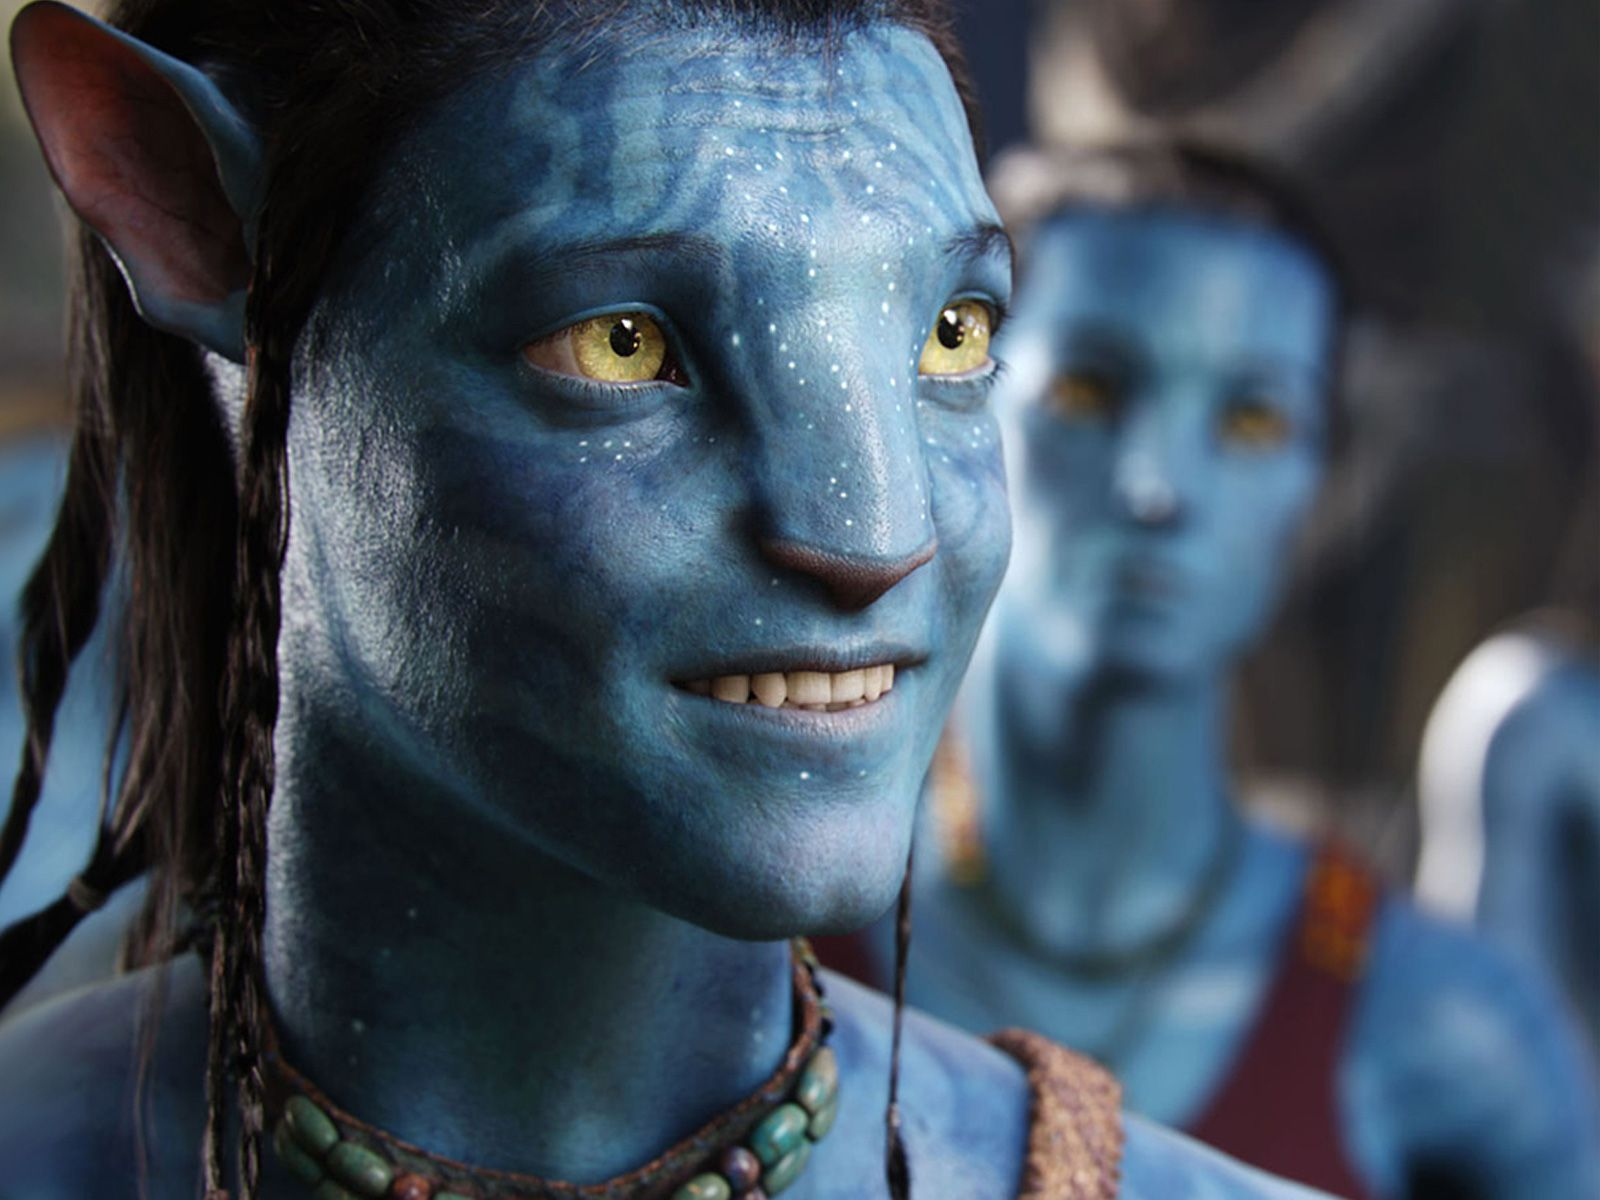 Jake Sully Avatar 2009 Wallpapers Hd Wallpapers Avatar Movie Avatar Films Avatar